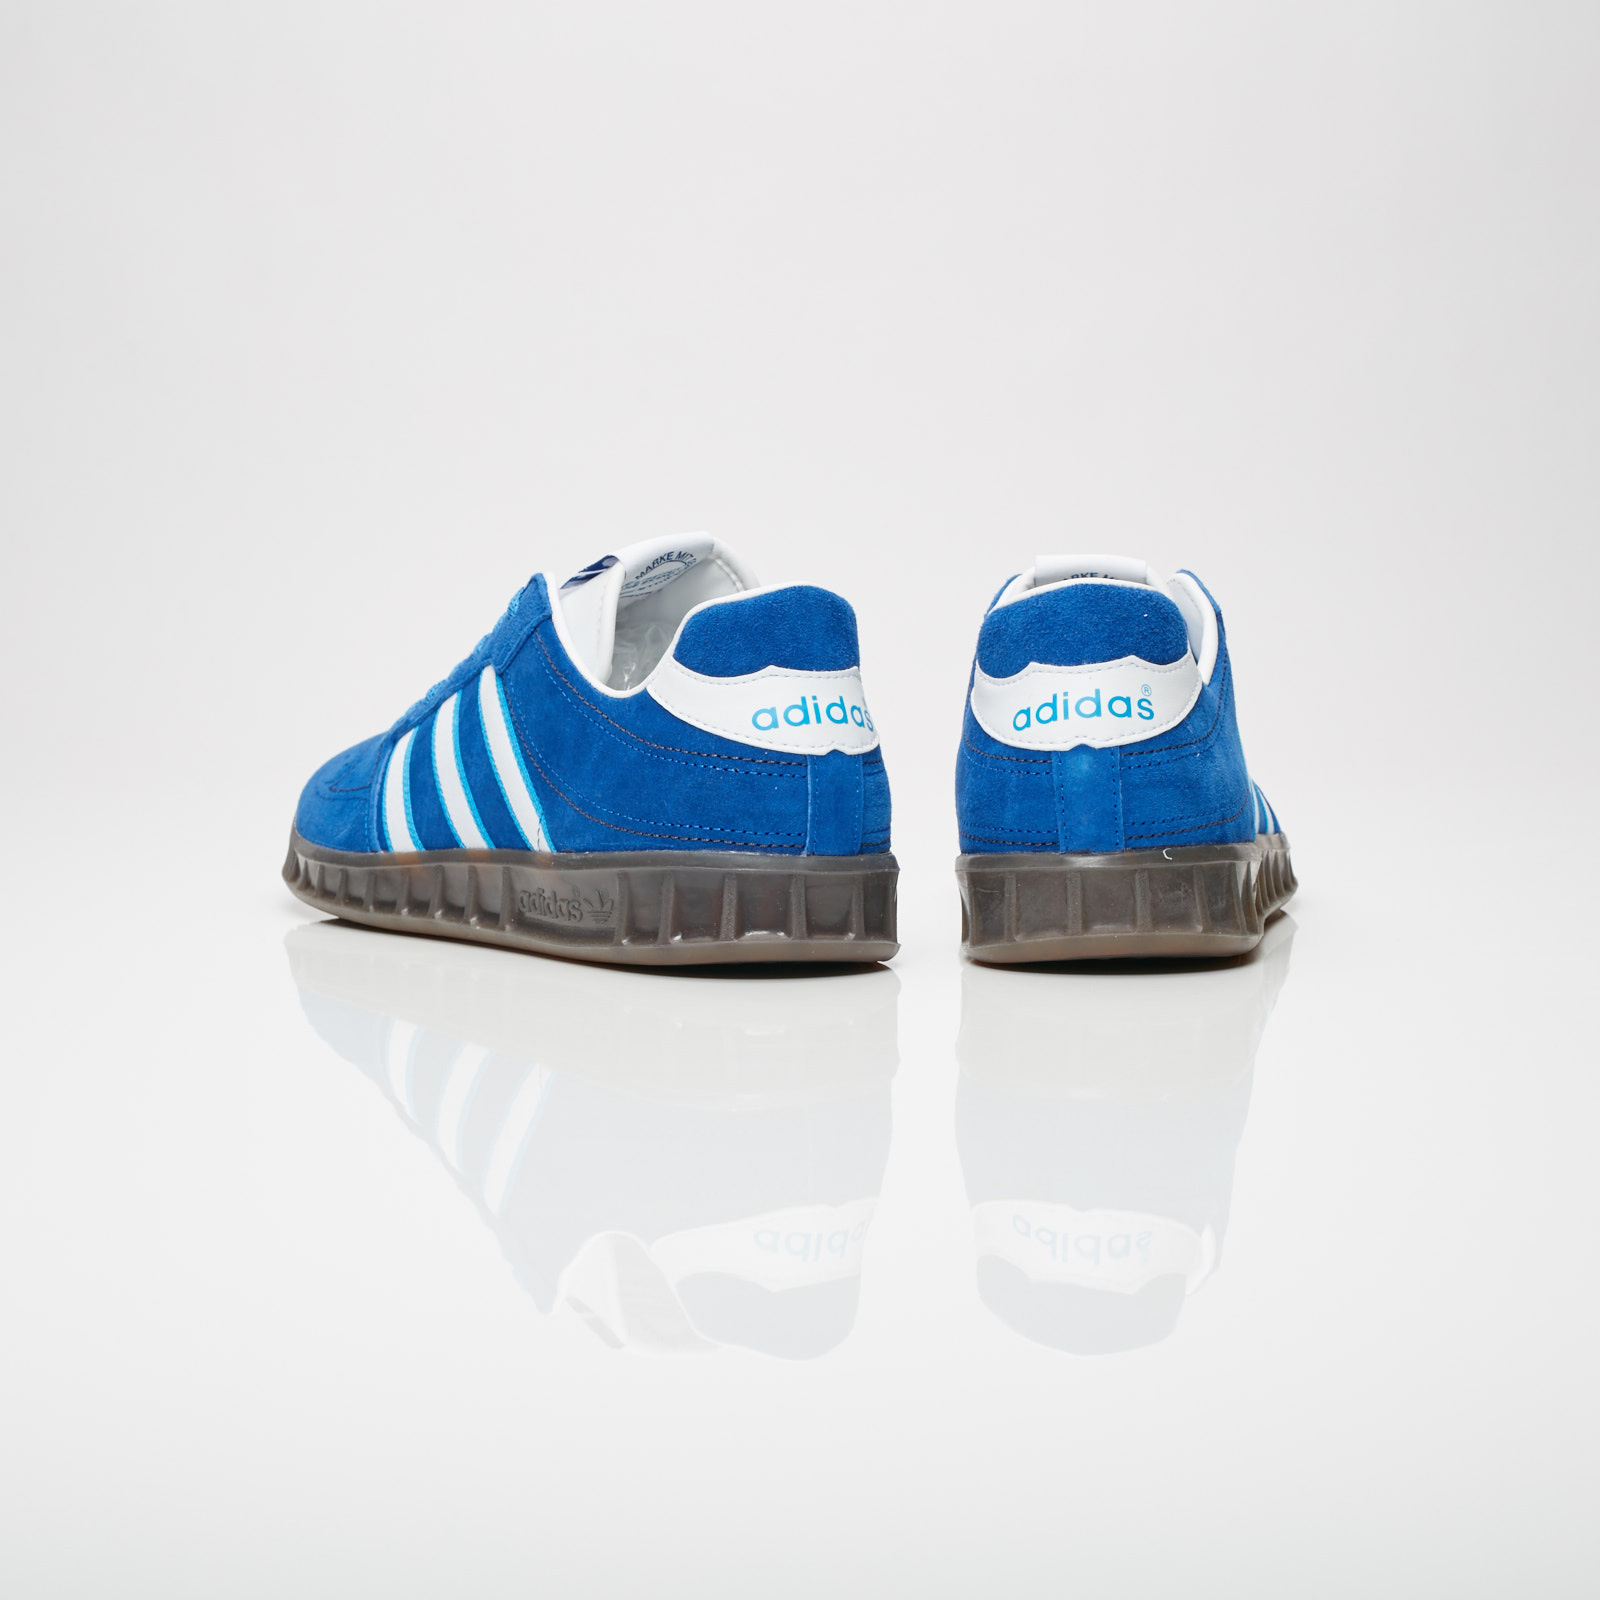 half off 37815 2557e adidas Handball Kreft - Da8748 - Sneakersnstuff   sneakers   streetwear  online since 1999